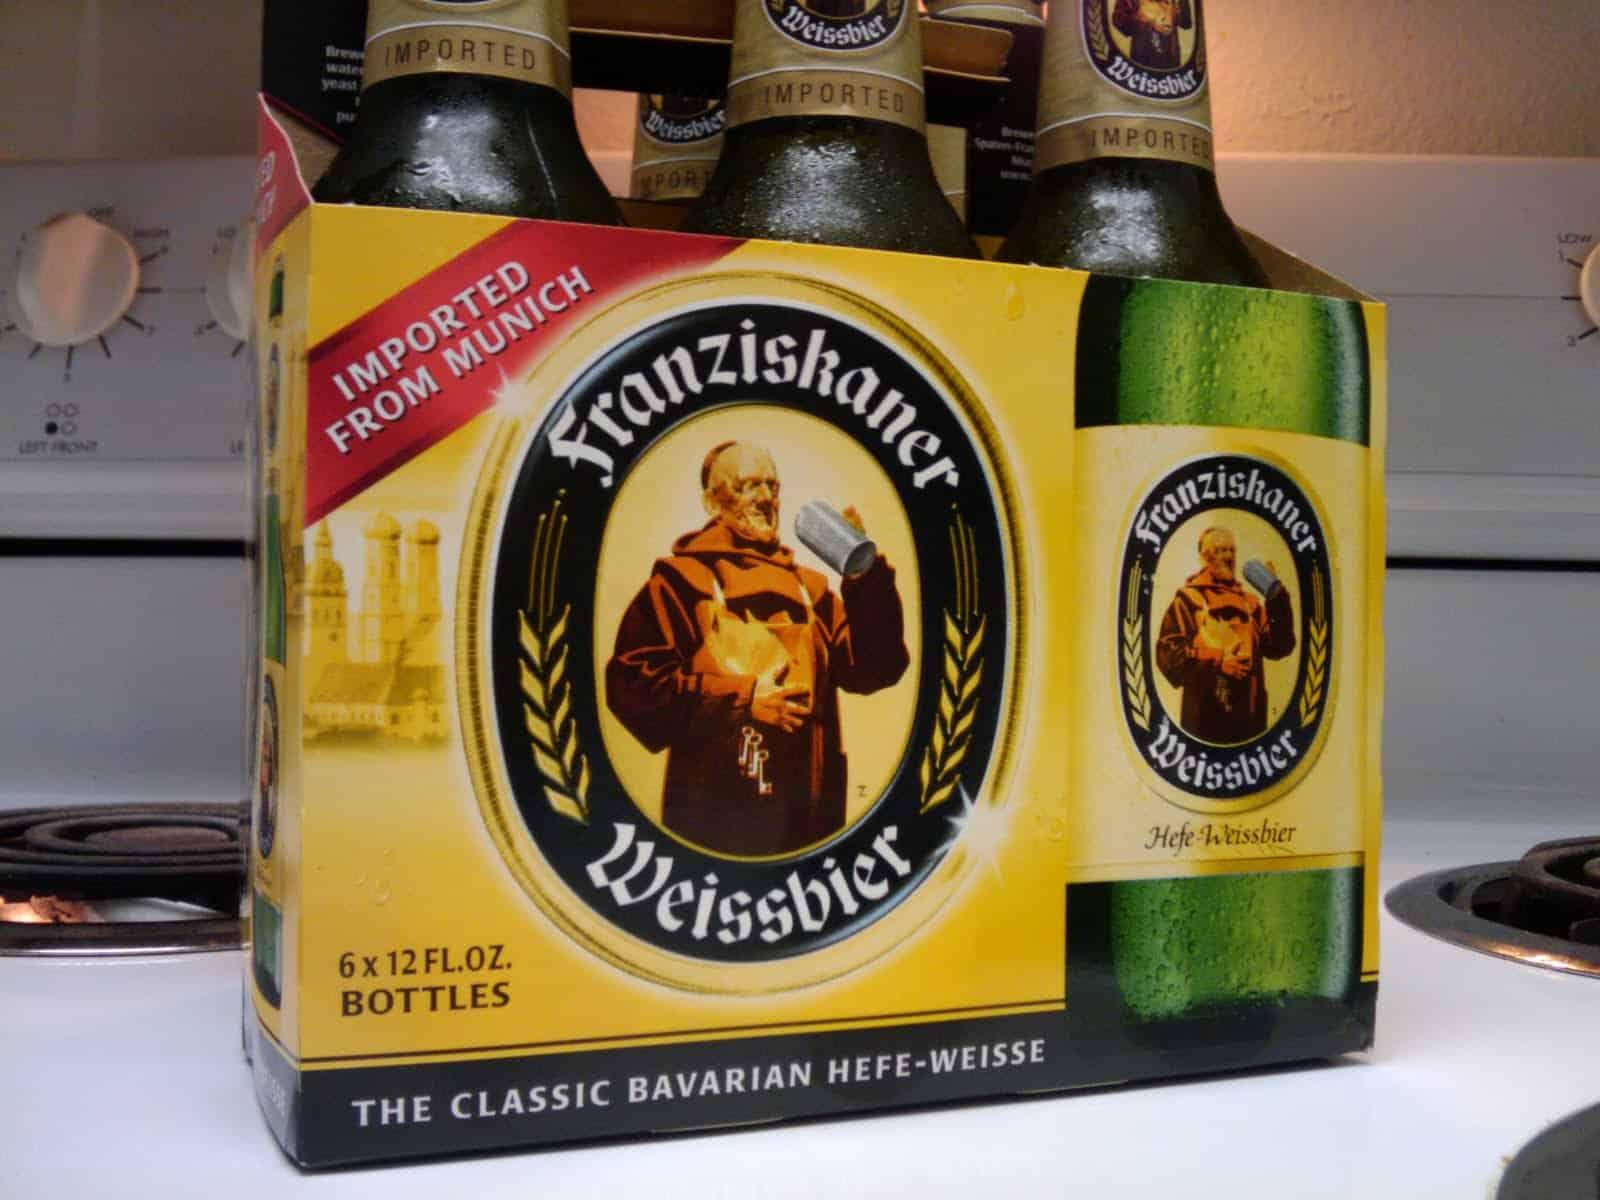 Spaten-Franziskaner-Bräu Franziskaner Hefe-Weisse – best tasting beer